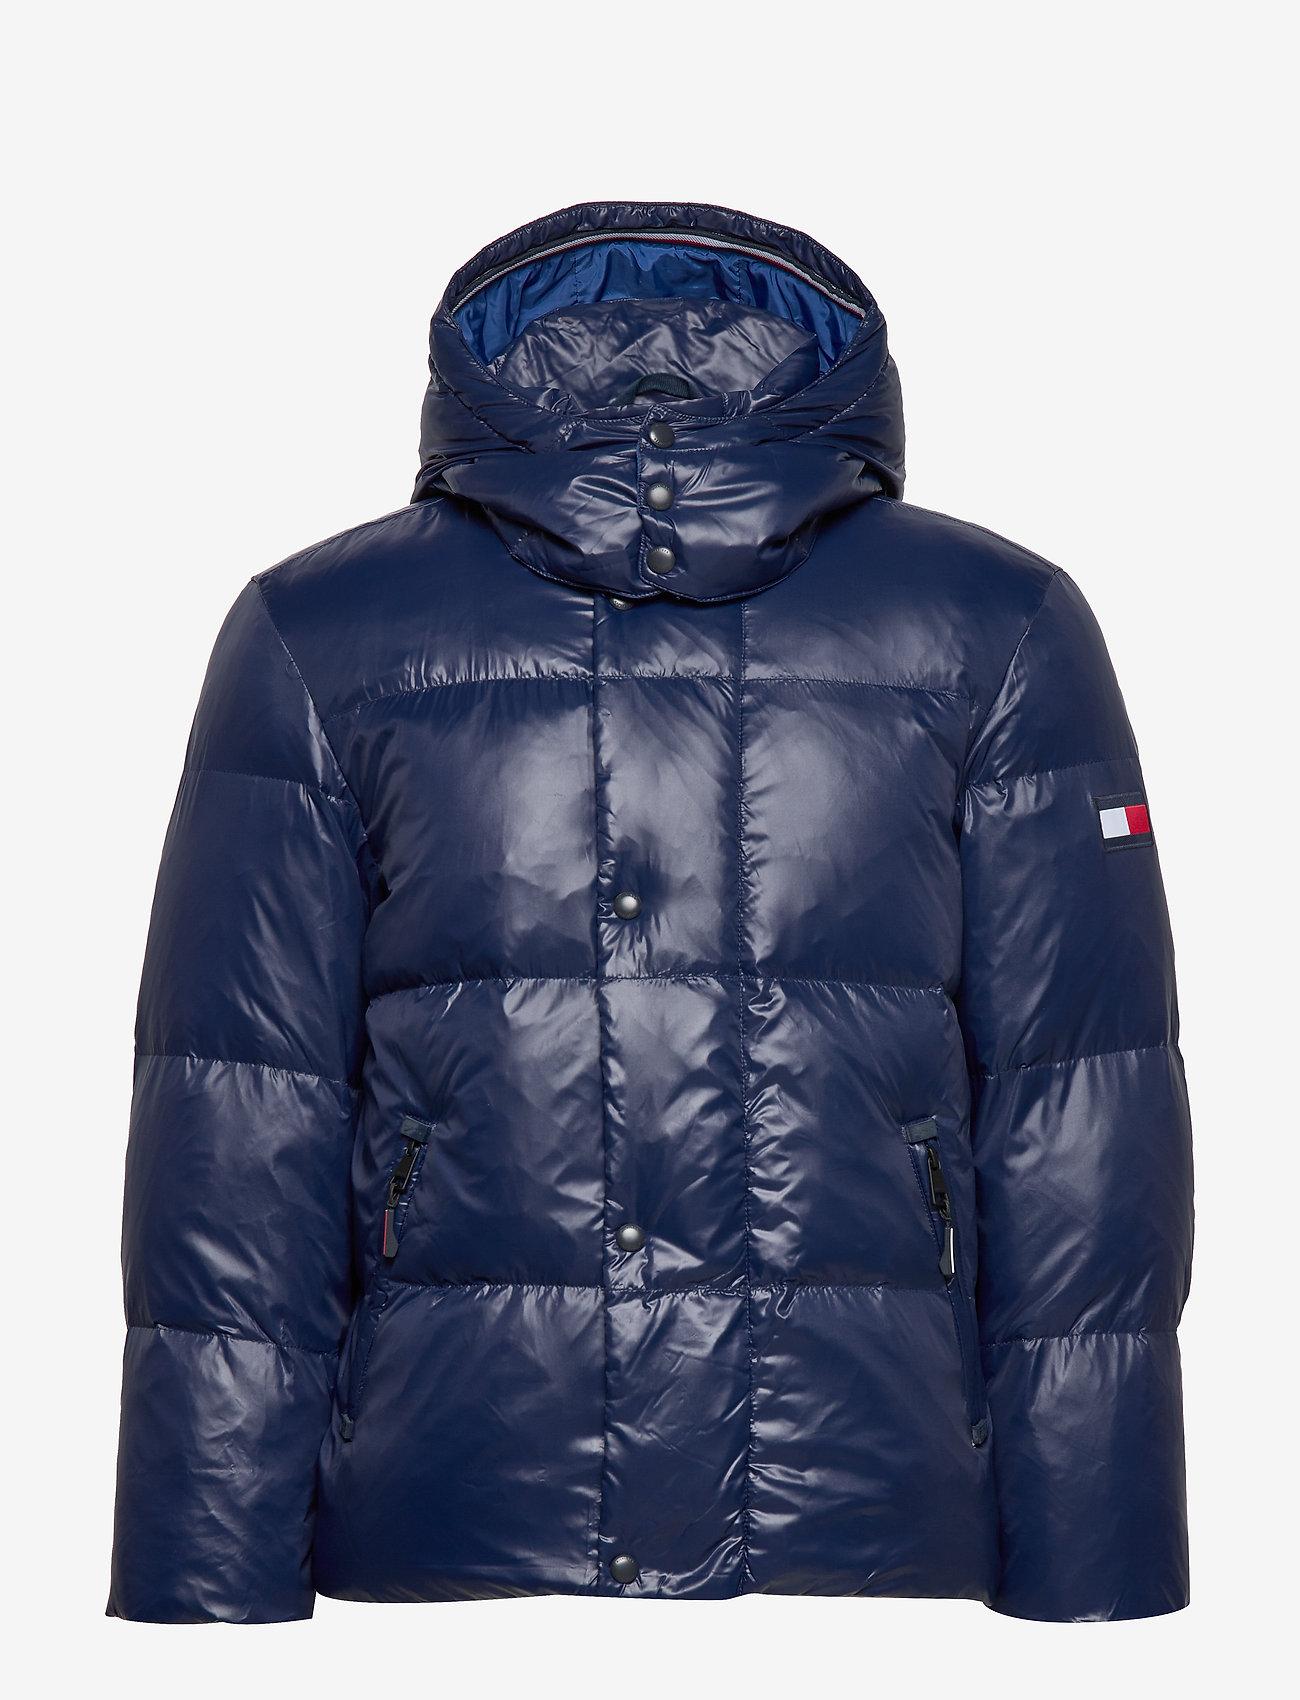 Tommy Hilfiger - SHINY HOODED BOMBER - padded jackets - maritime blue - 1